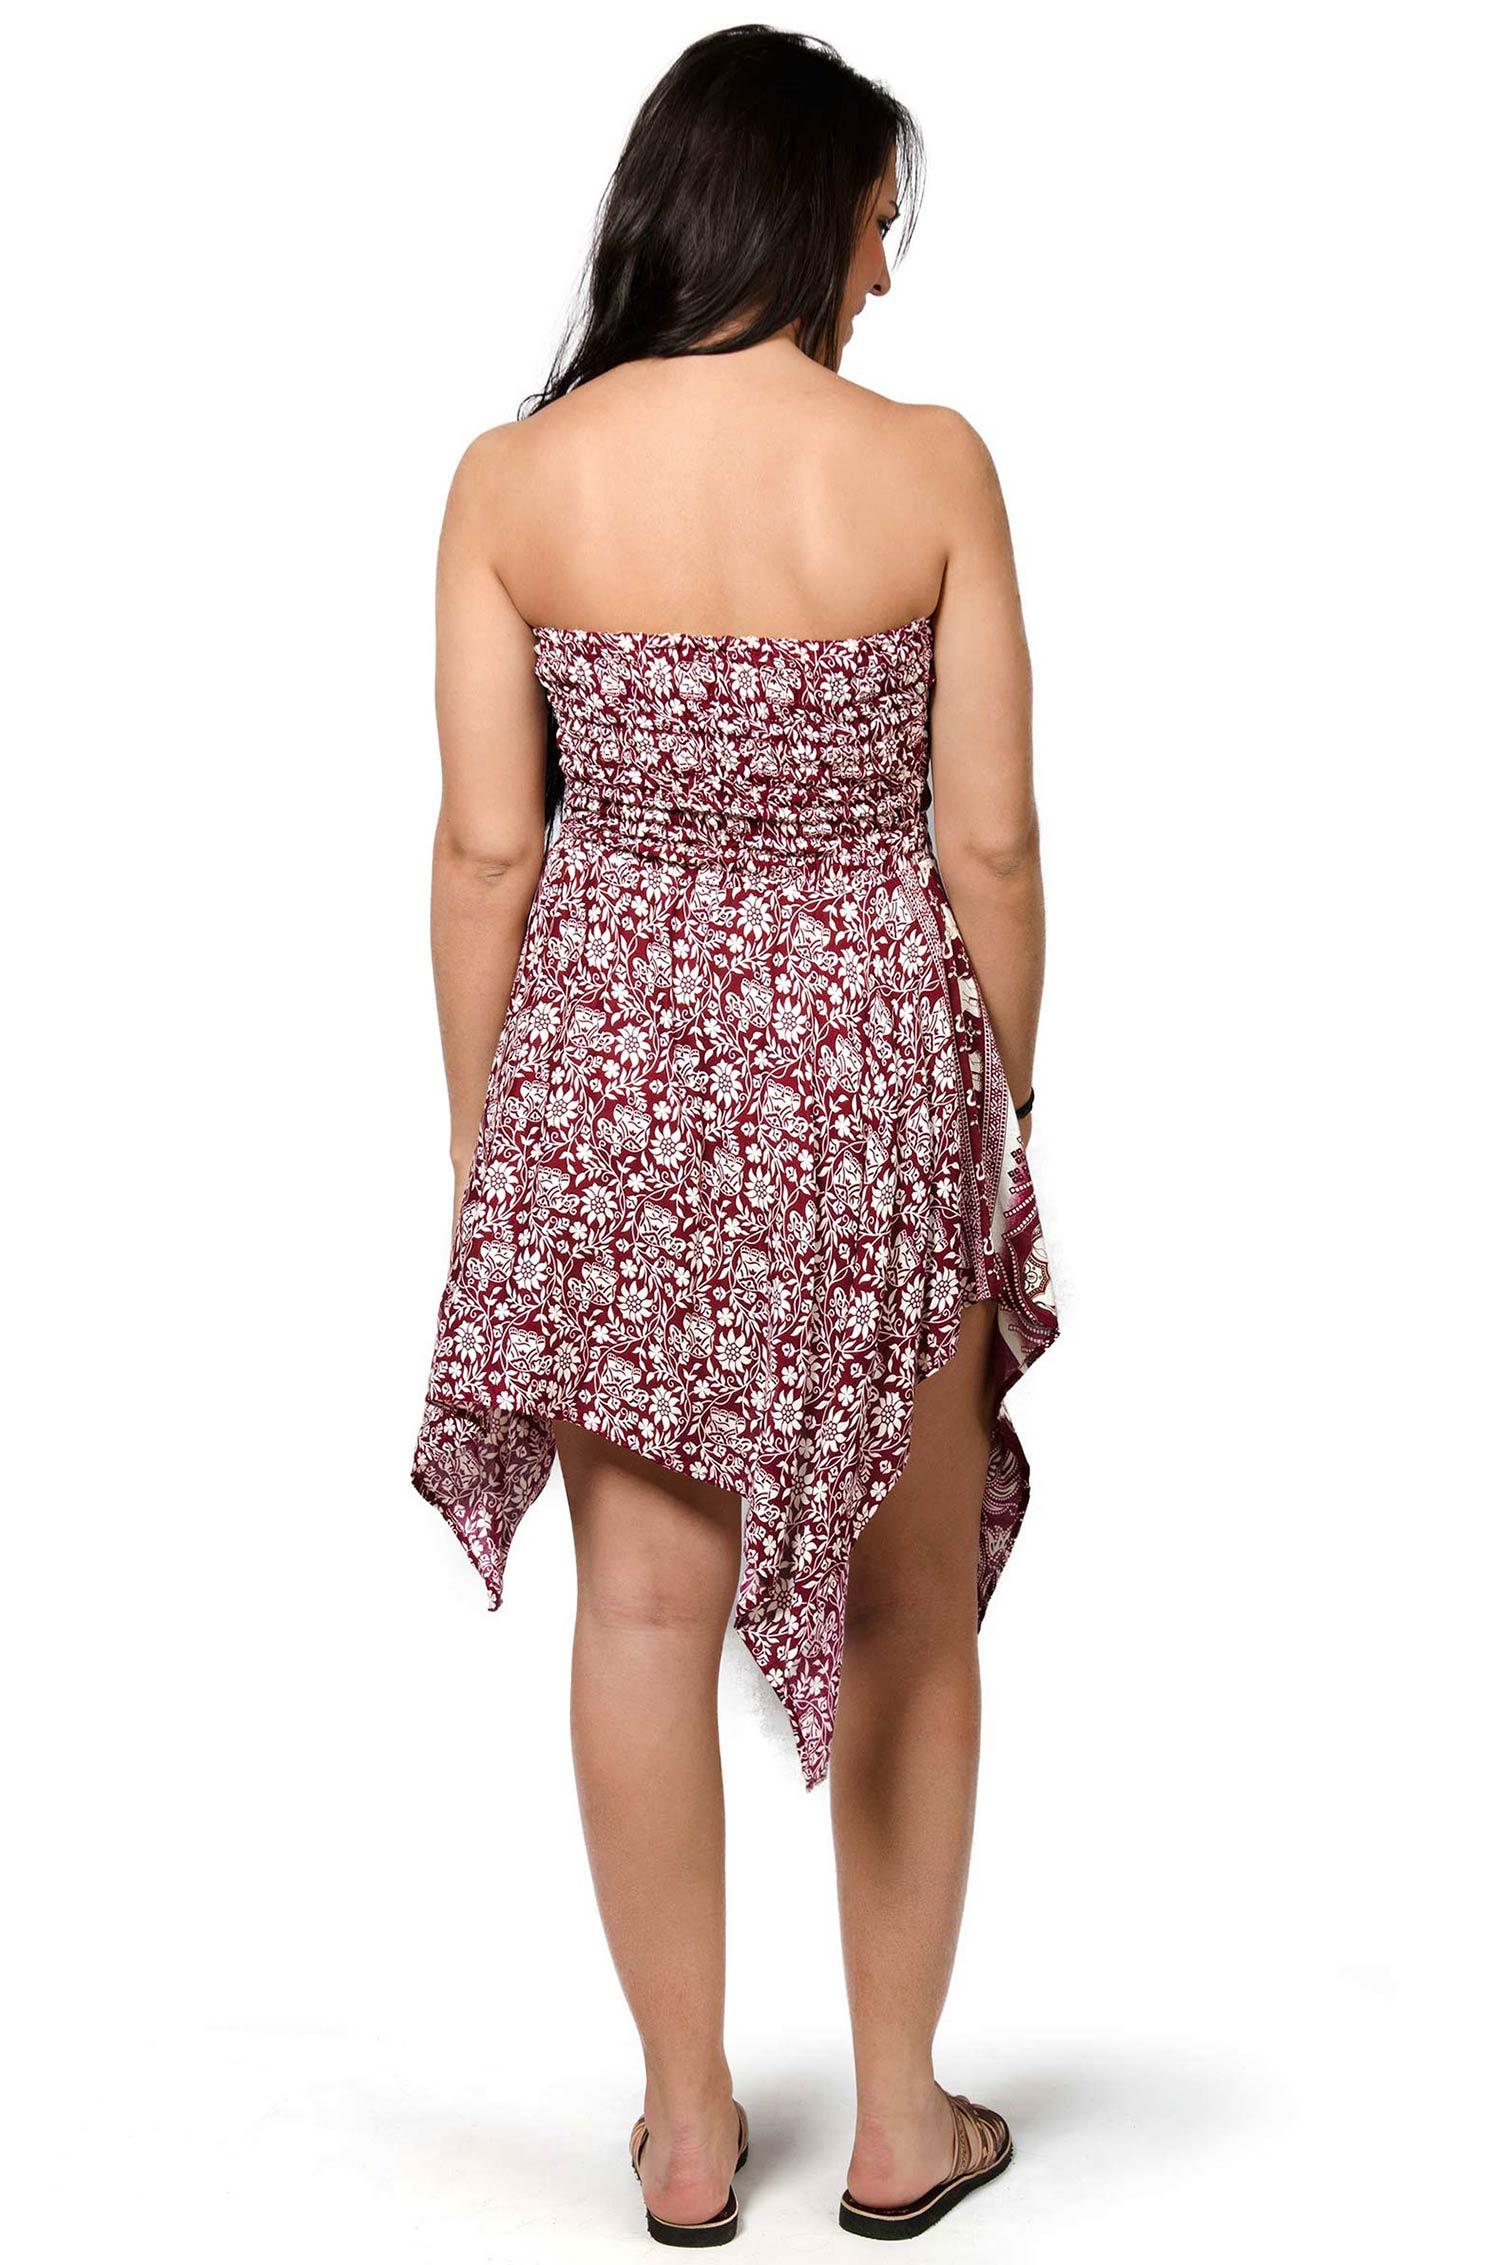 Elephant Print Convertible Fairy Dress - Skirt - Red